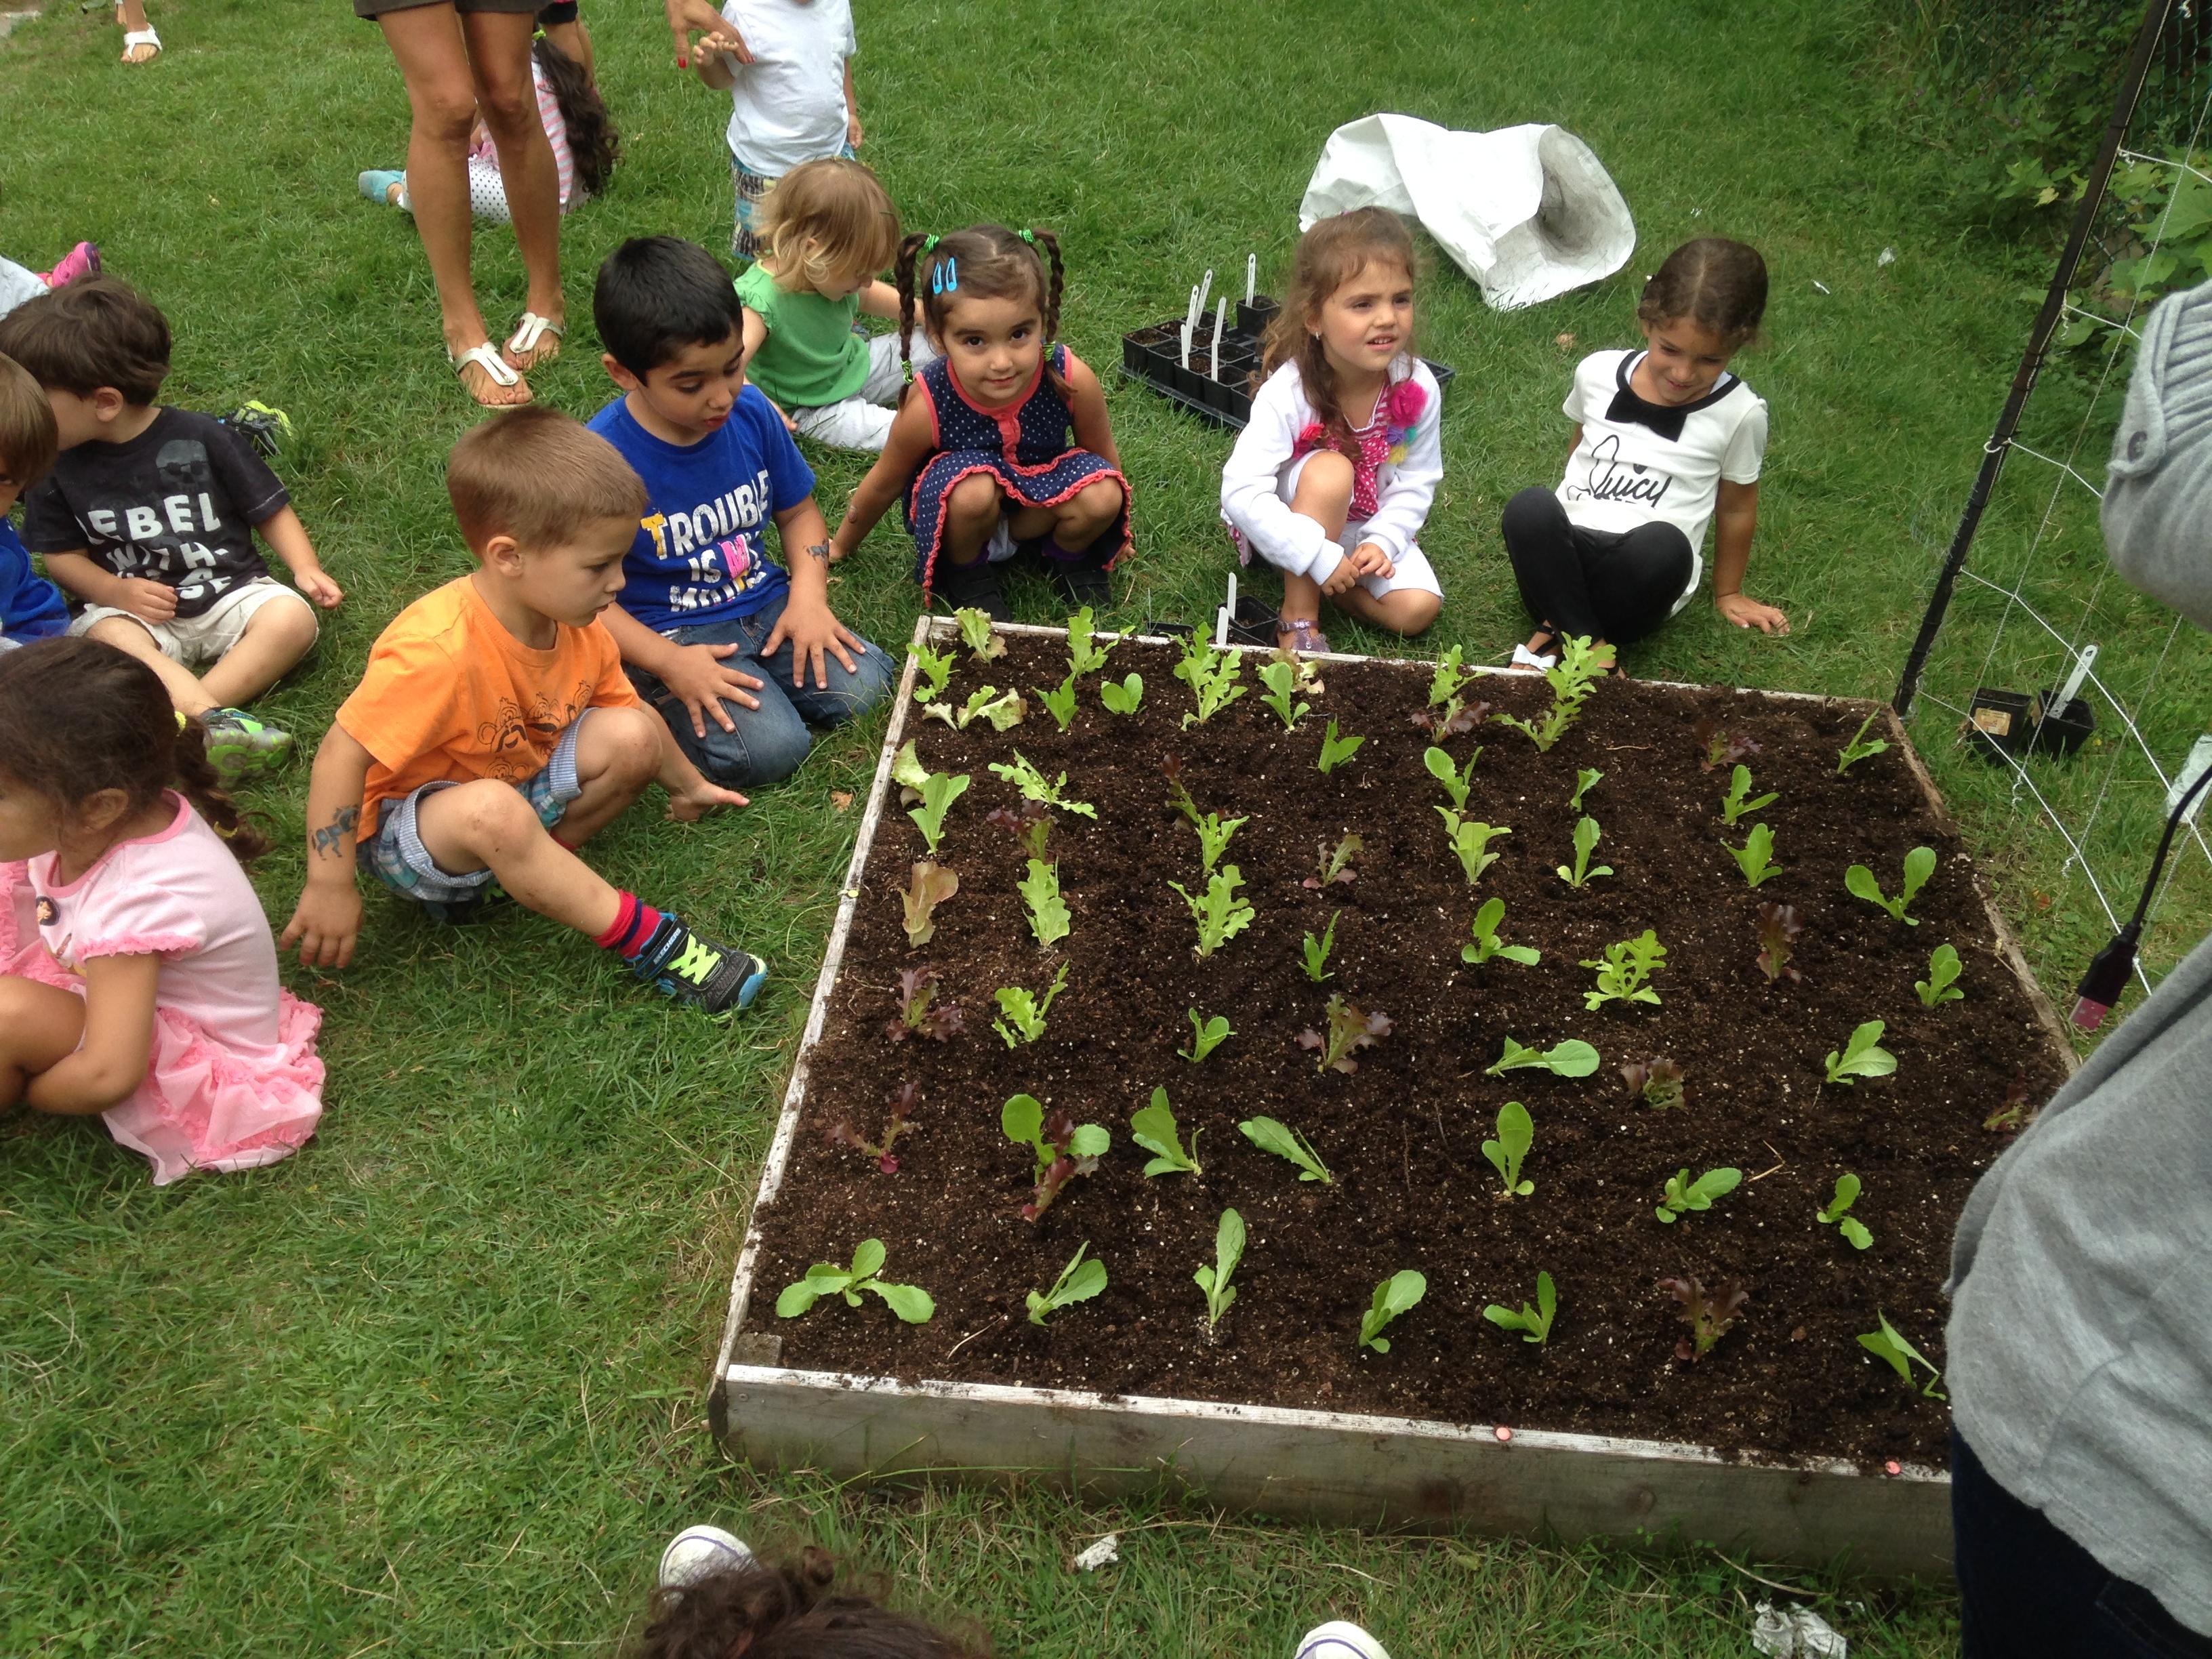 Kids love to dig in the dirt school vegetable gardens